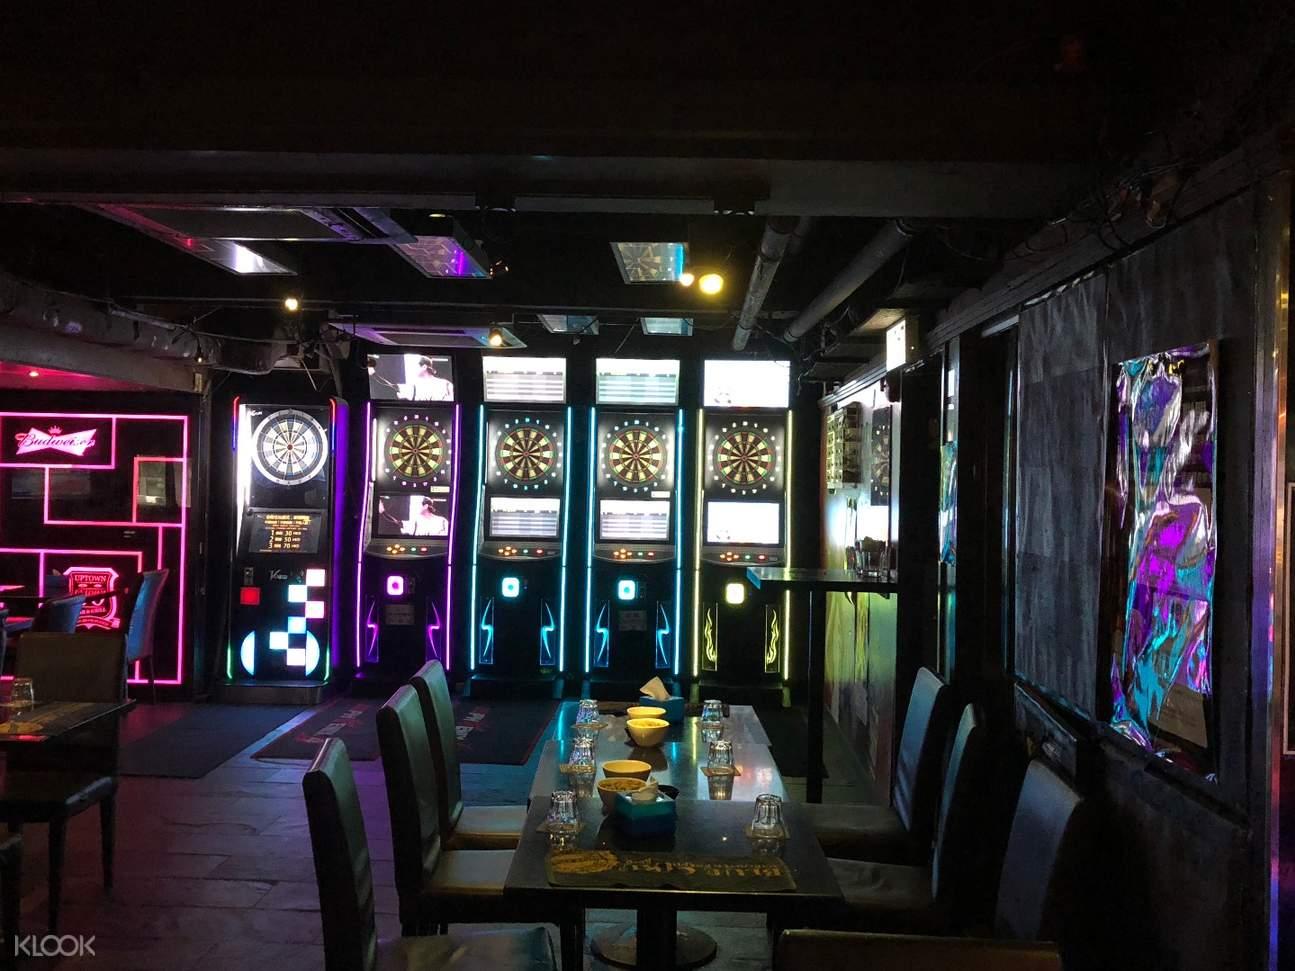 湾仔Uptown 90 Bar & Grill室内环境